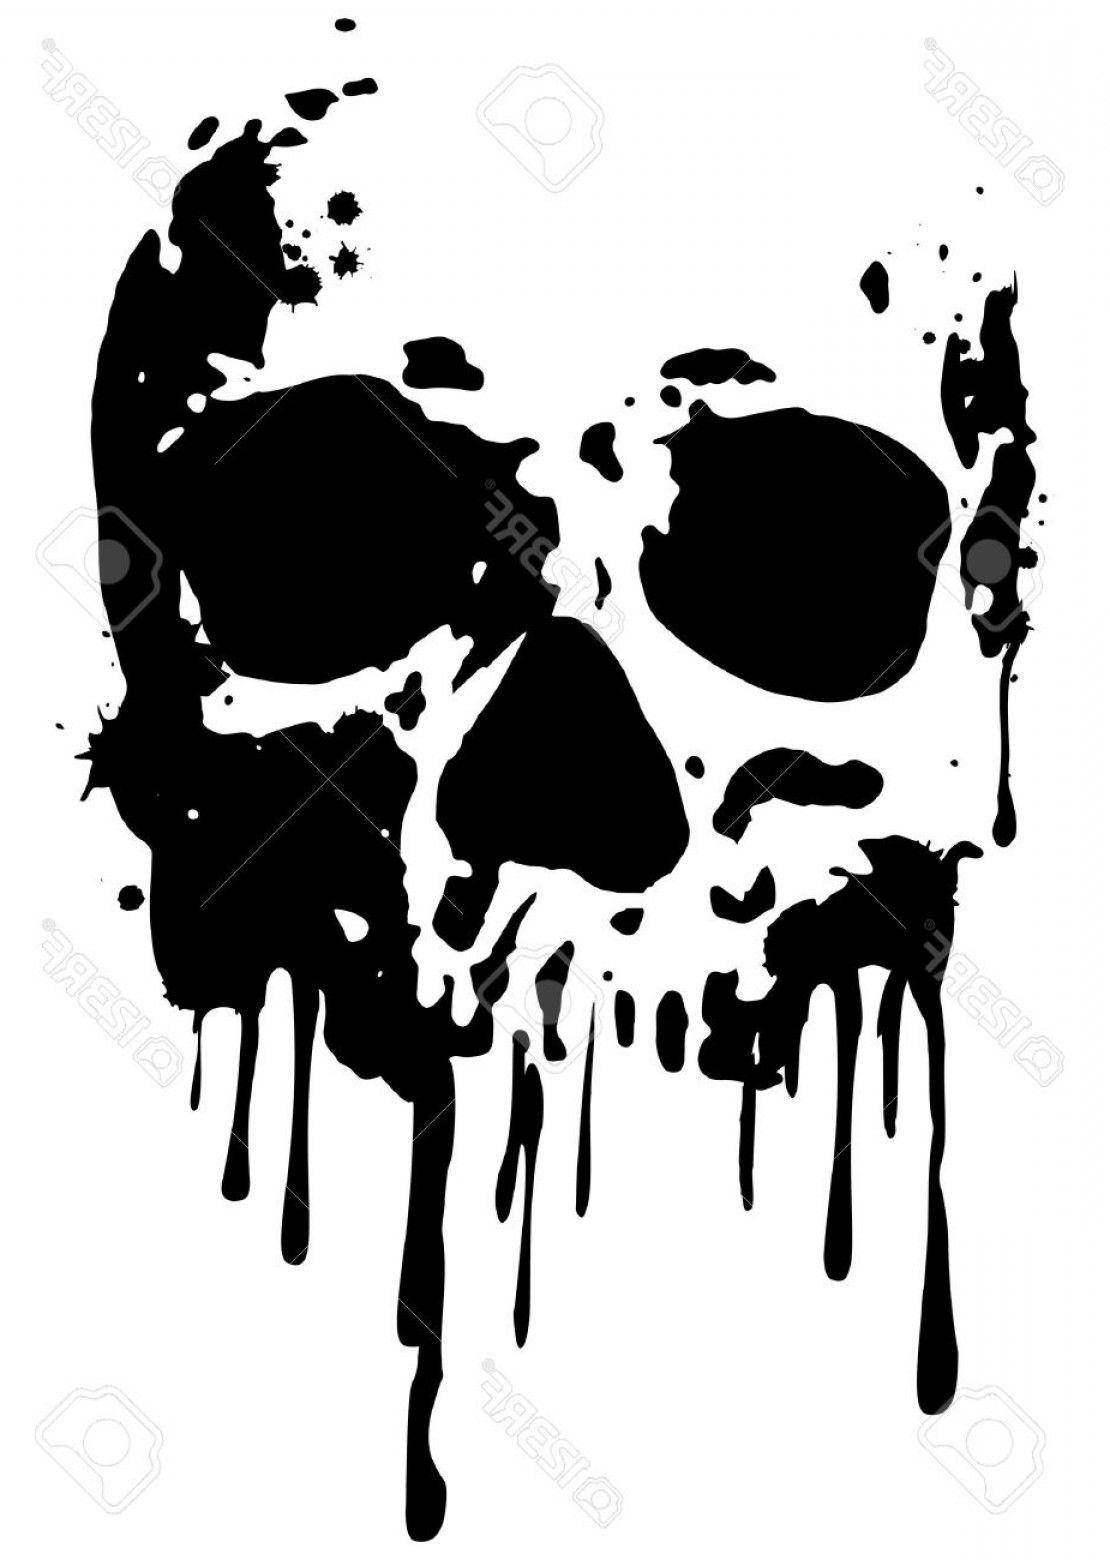 Bildergebnis fr graffiti schablone gasmaske grafitti t - Pochoir Tete De Mort